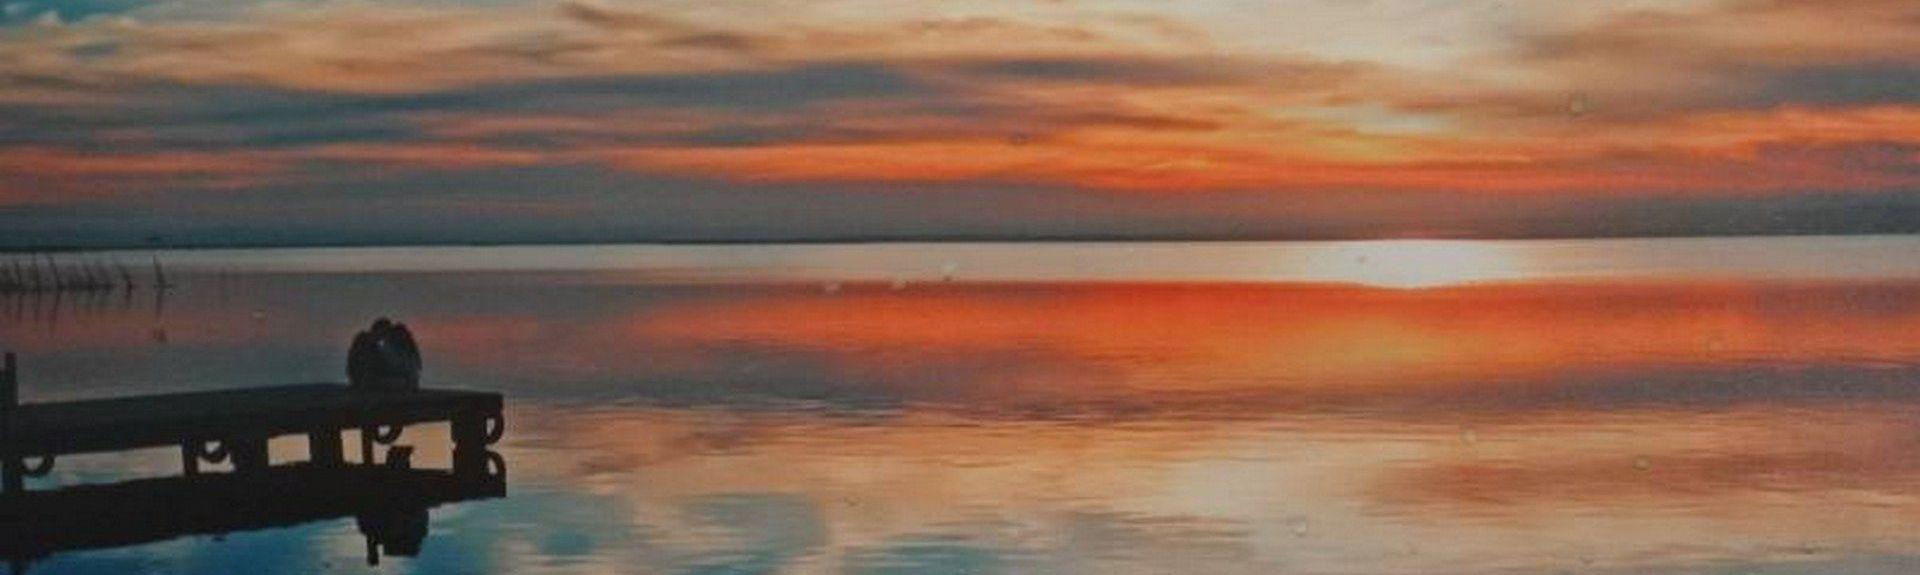 Jurien Bay Harbour, Jurien Bay, Australia Occidentale, Australia